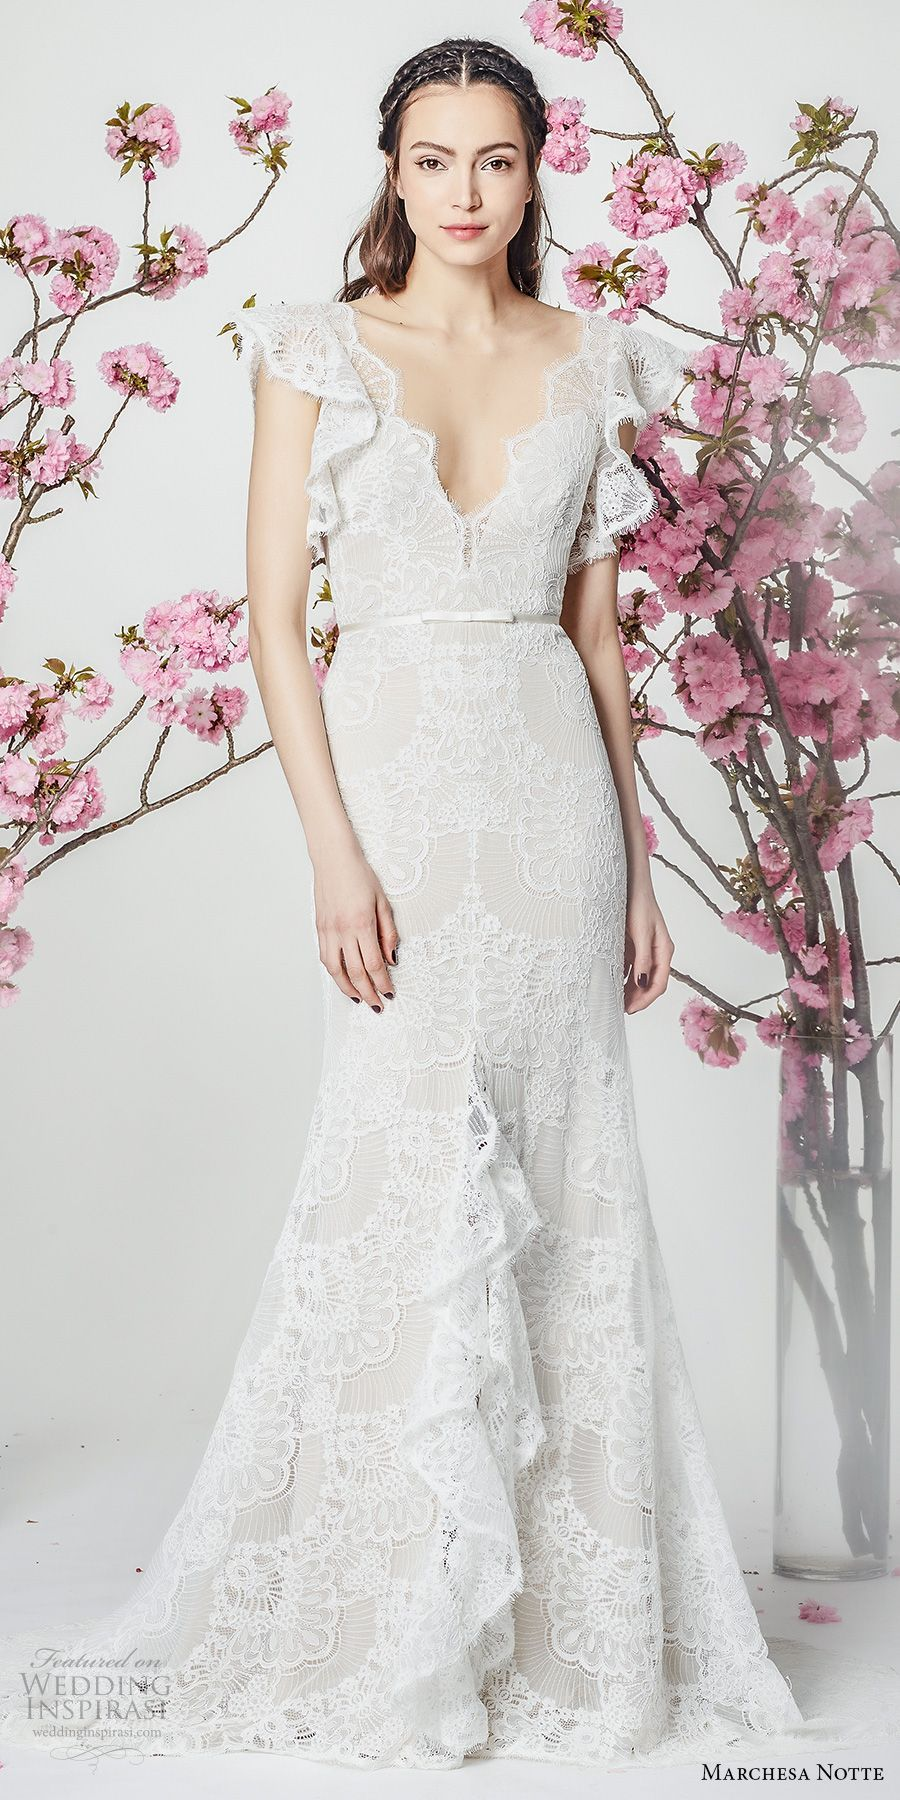 Marchesa notte spring bridal butterfly sleeves v neck full